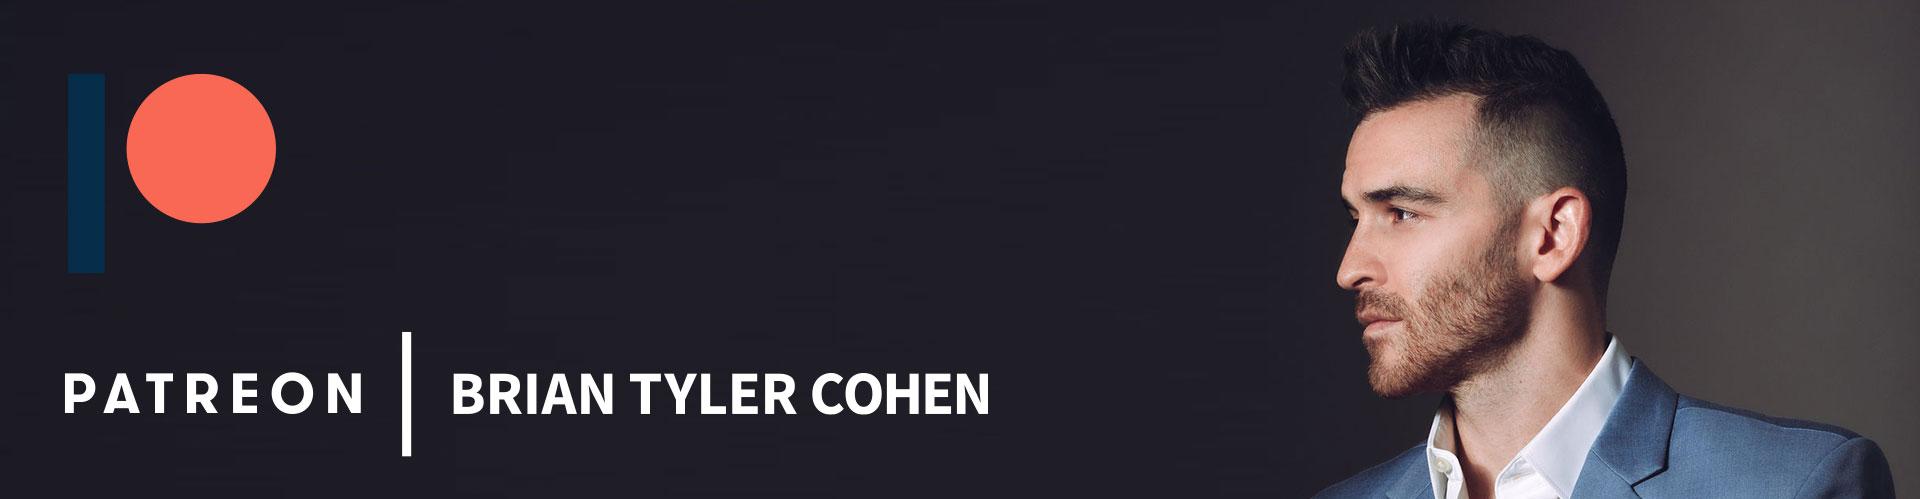 Contribute-Mobile-Brian-Tyler-Cohen